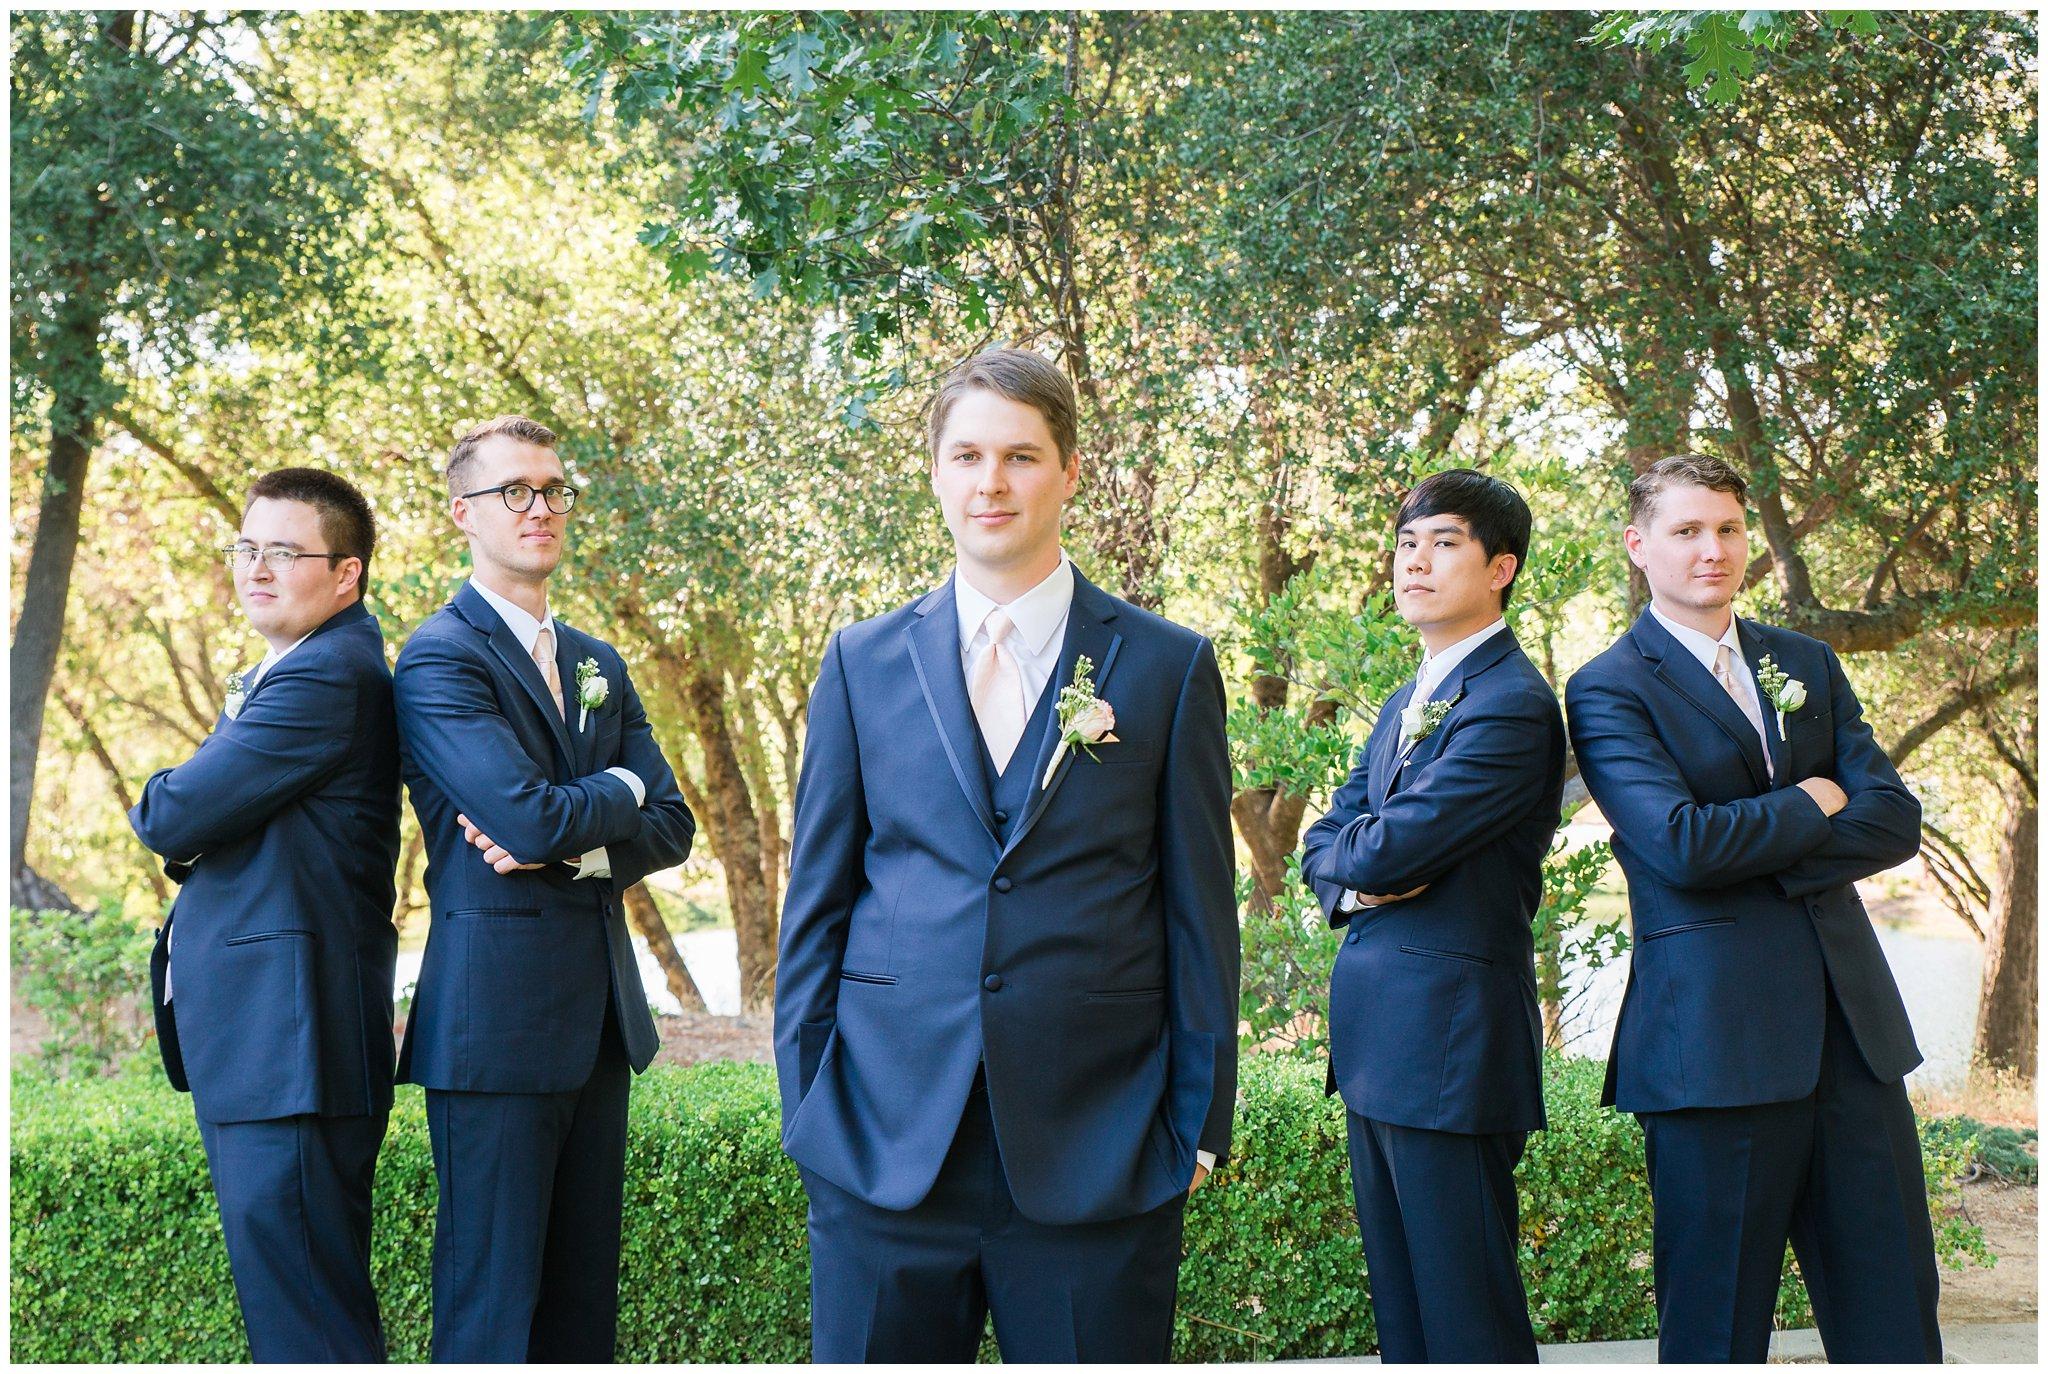 David-Girard-Vineyards-Wedding-Wedgewood-Weddings-46.jpg